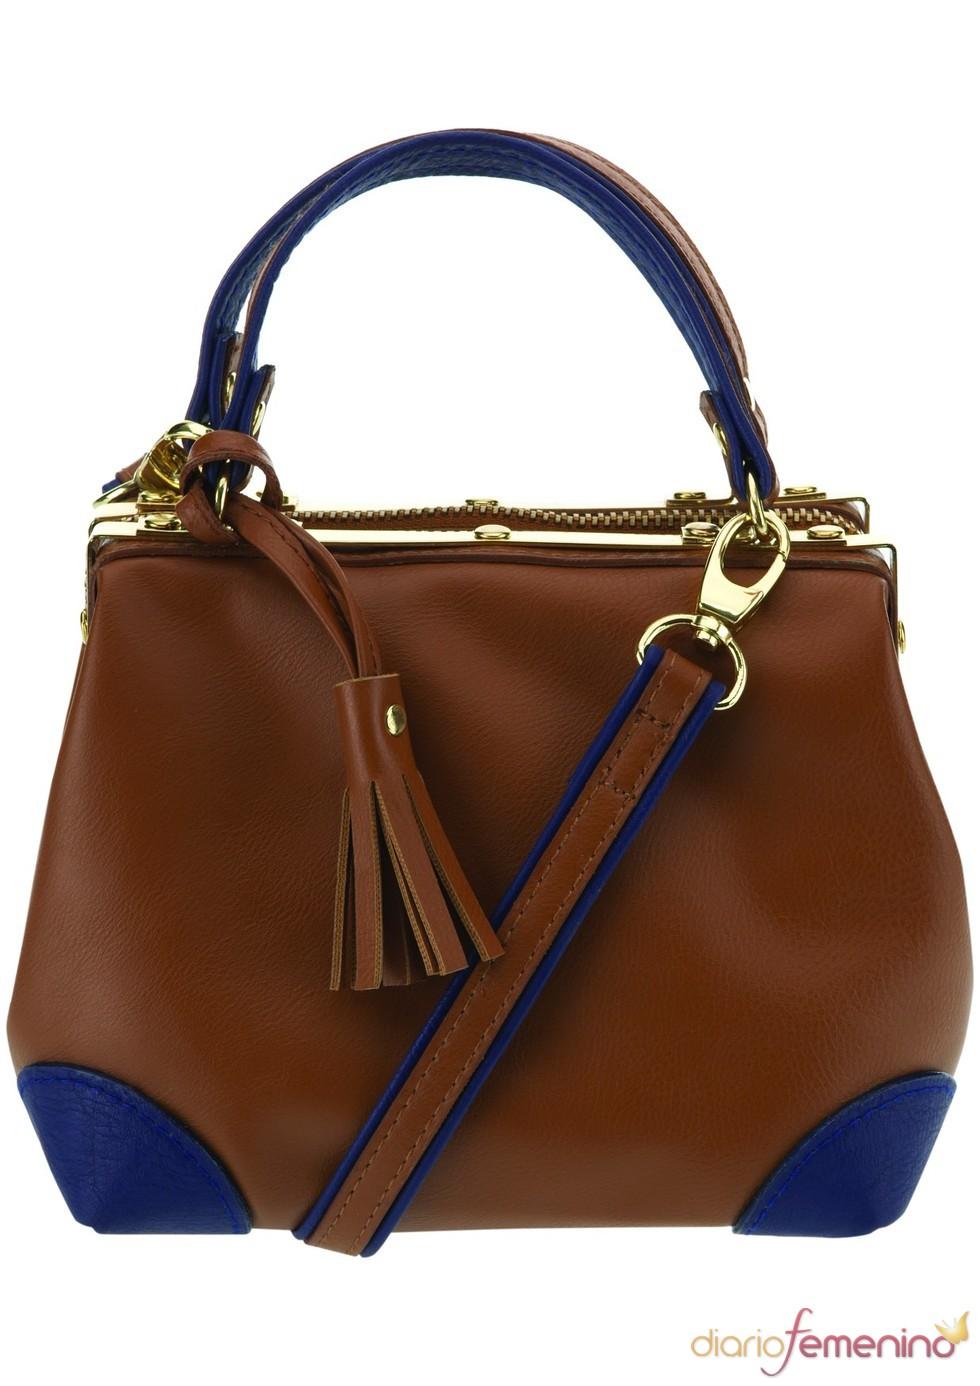 Bolso marrón y azul marino de TopShop, 53 euros